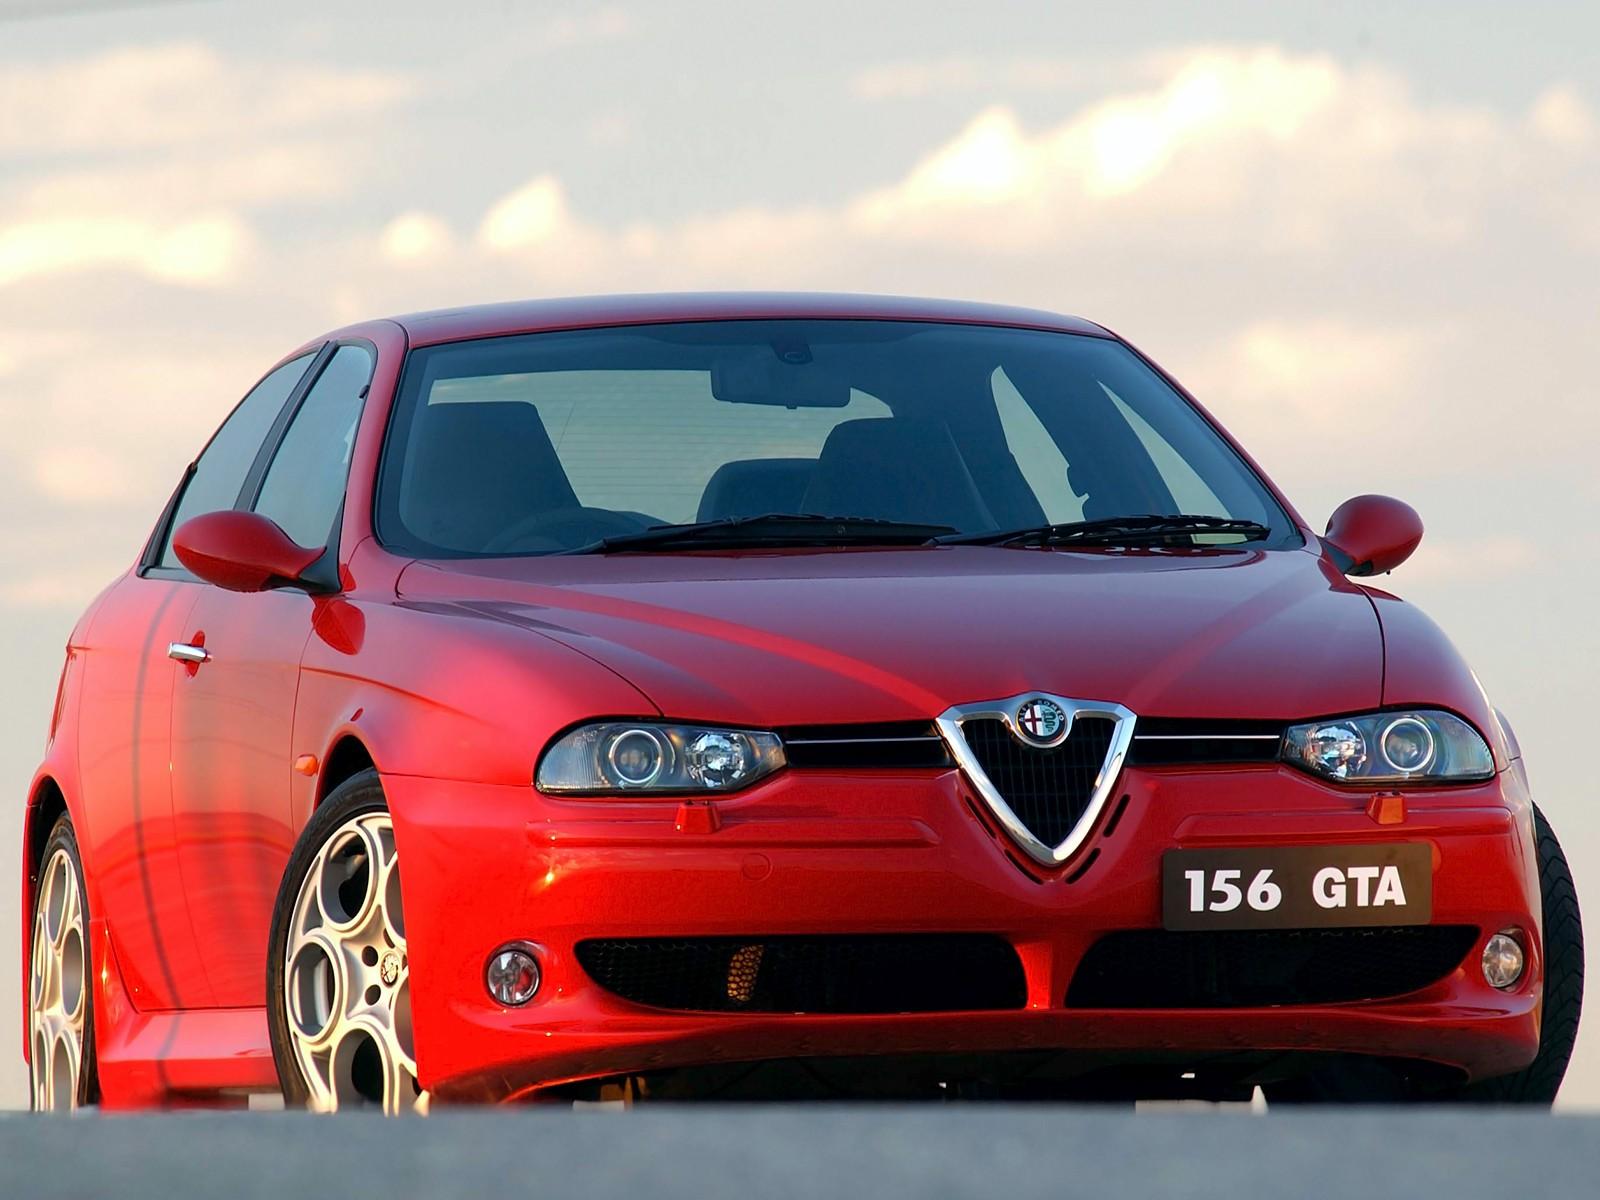 ALFA ROMEO 156 GTA Specs 2001 2002 2003 2004 2005